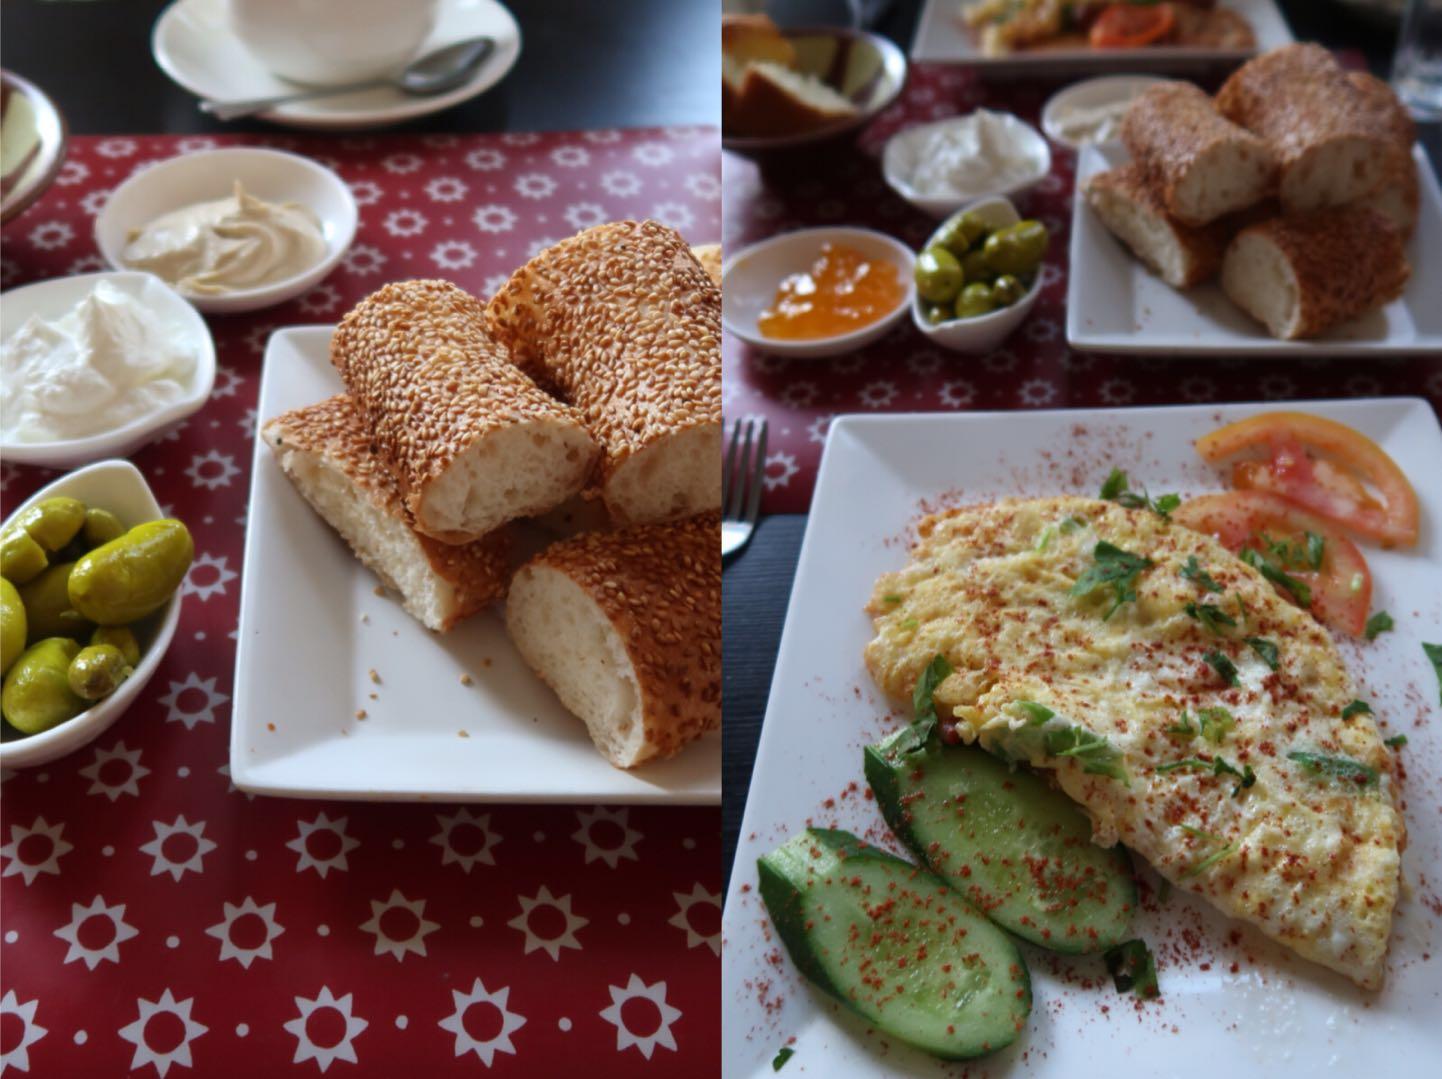 upsouth-mingmingfeng-jordan-travel-amman-day2-breakfast.jpeg